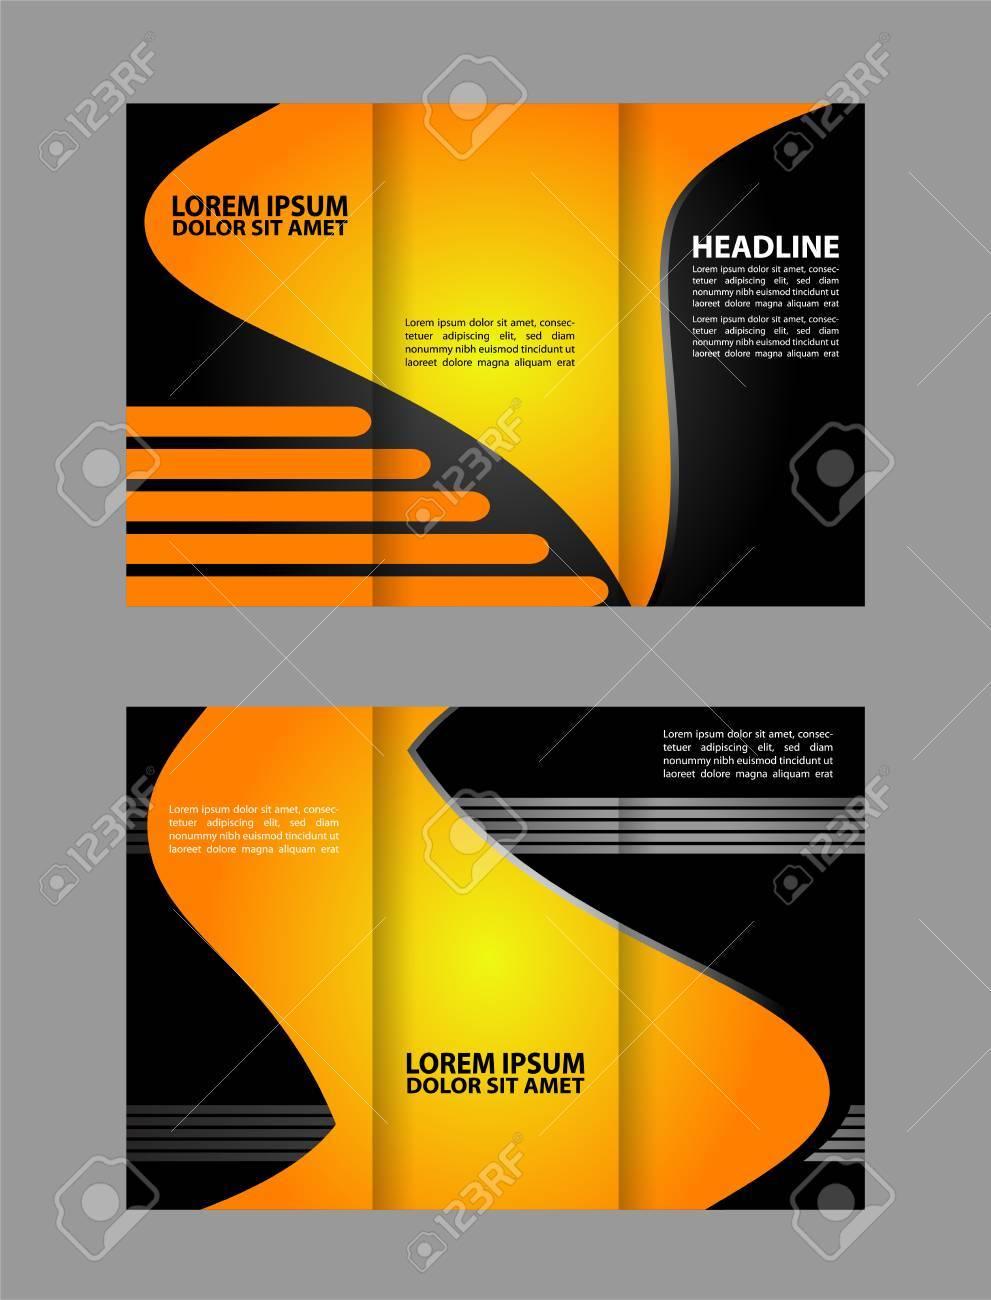 tri fold brochure template design with orange color stock vector 59490282